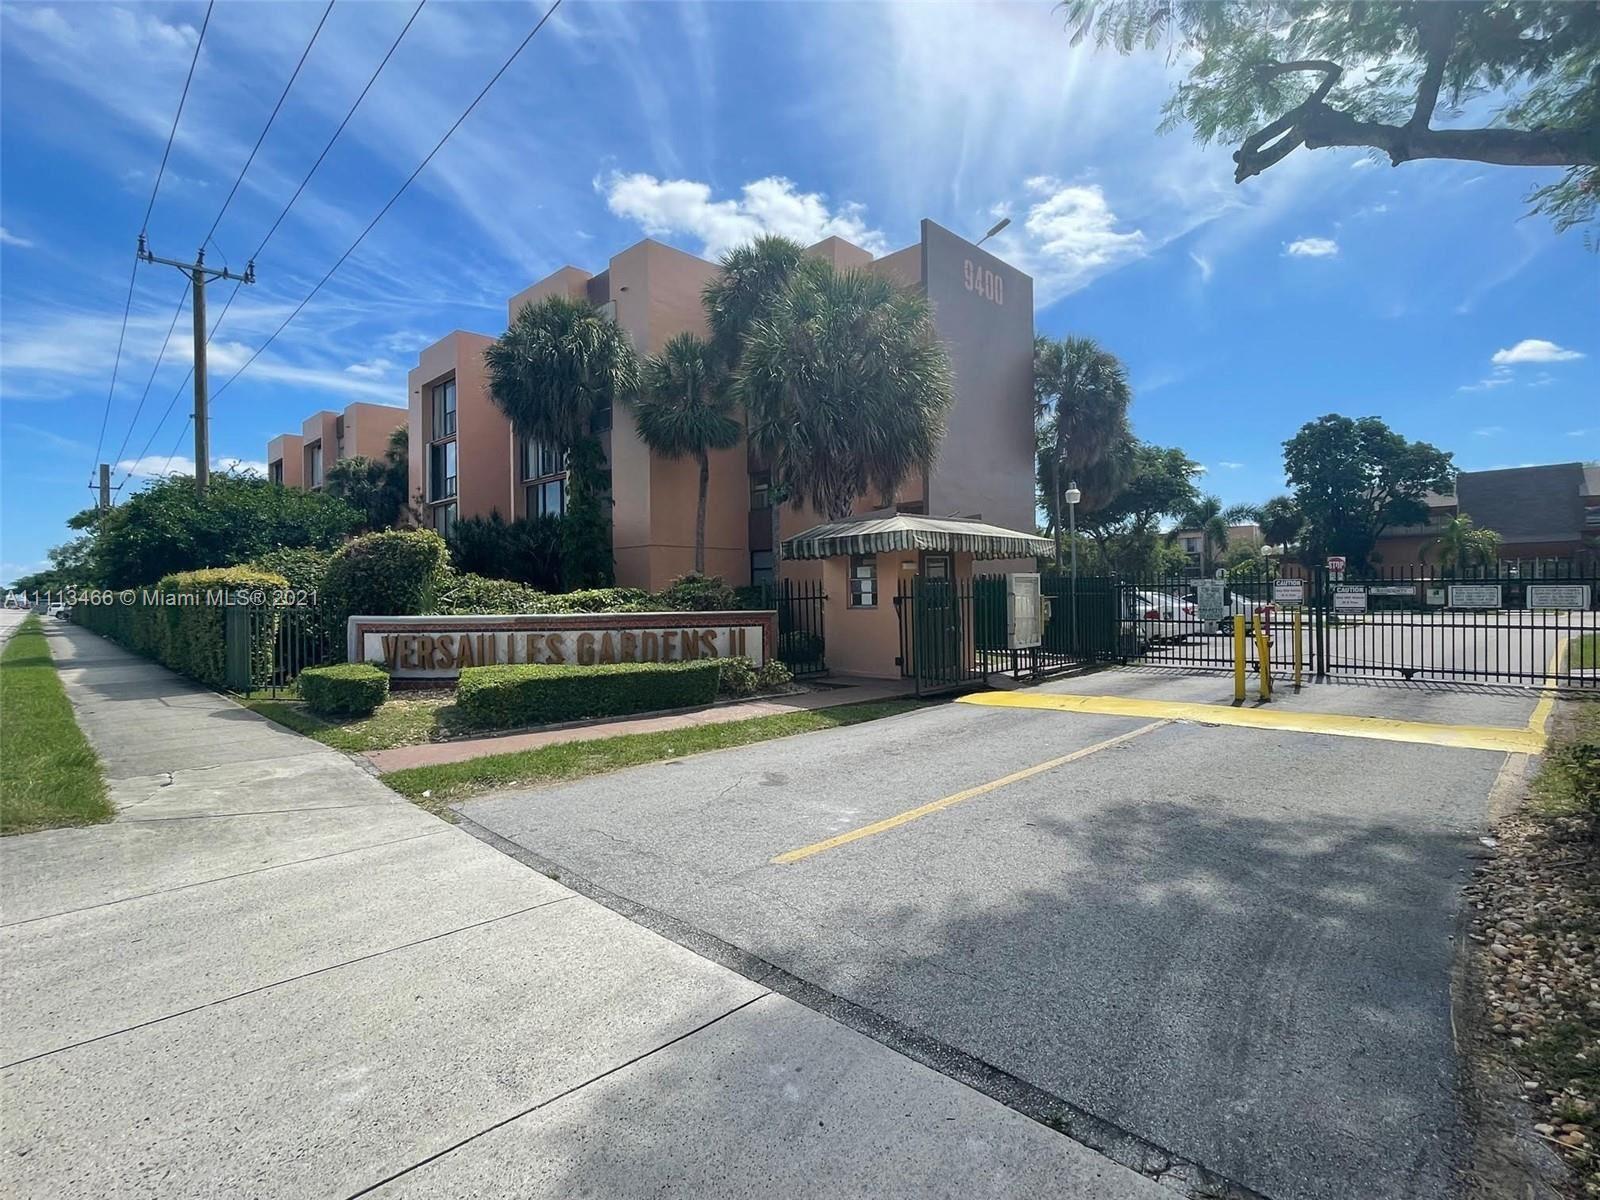 9400 W Flagler St #109, Miami, FL 33174 - #: A11113466